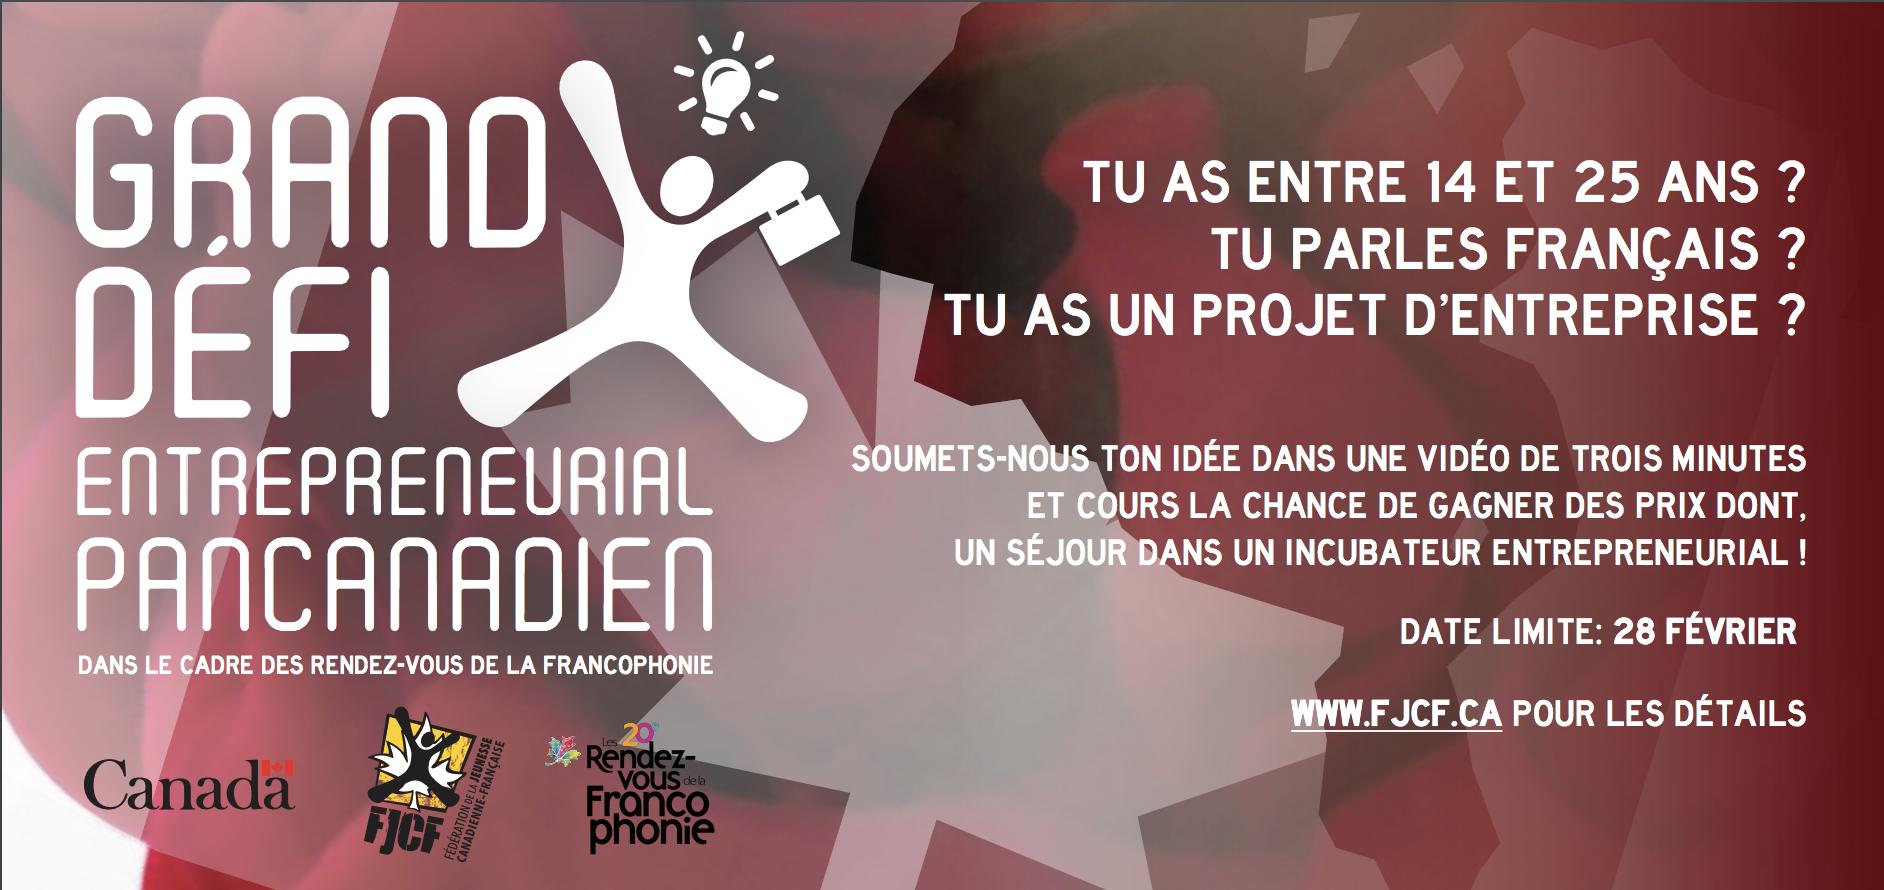 Defi Entrepreneurial pancanadien-Affiche_horizontale copie